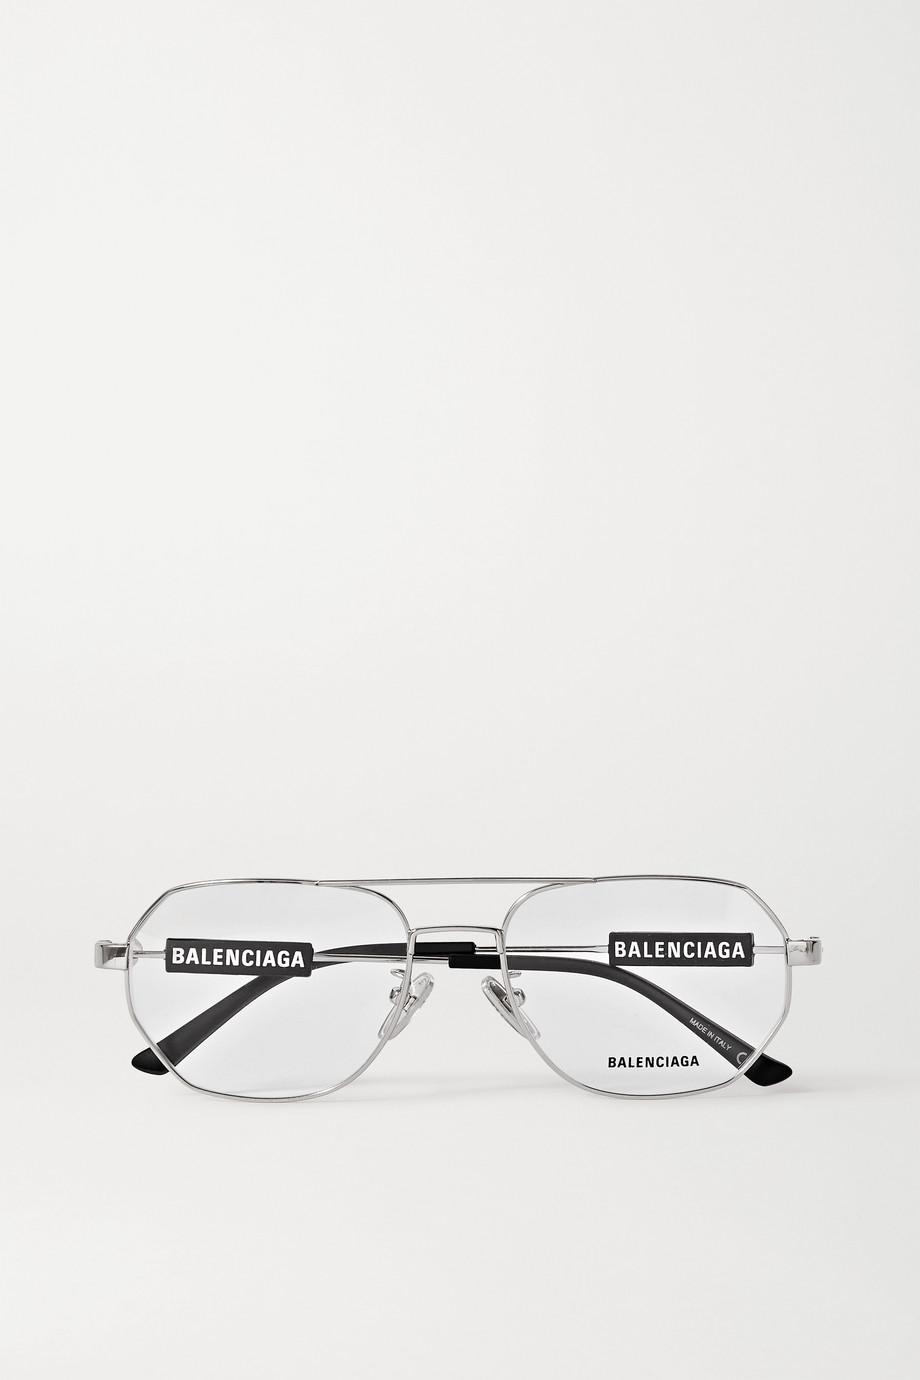 Balenciaga 银色金属飞行员光学眼镜